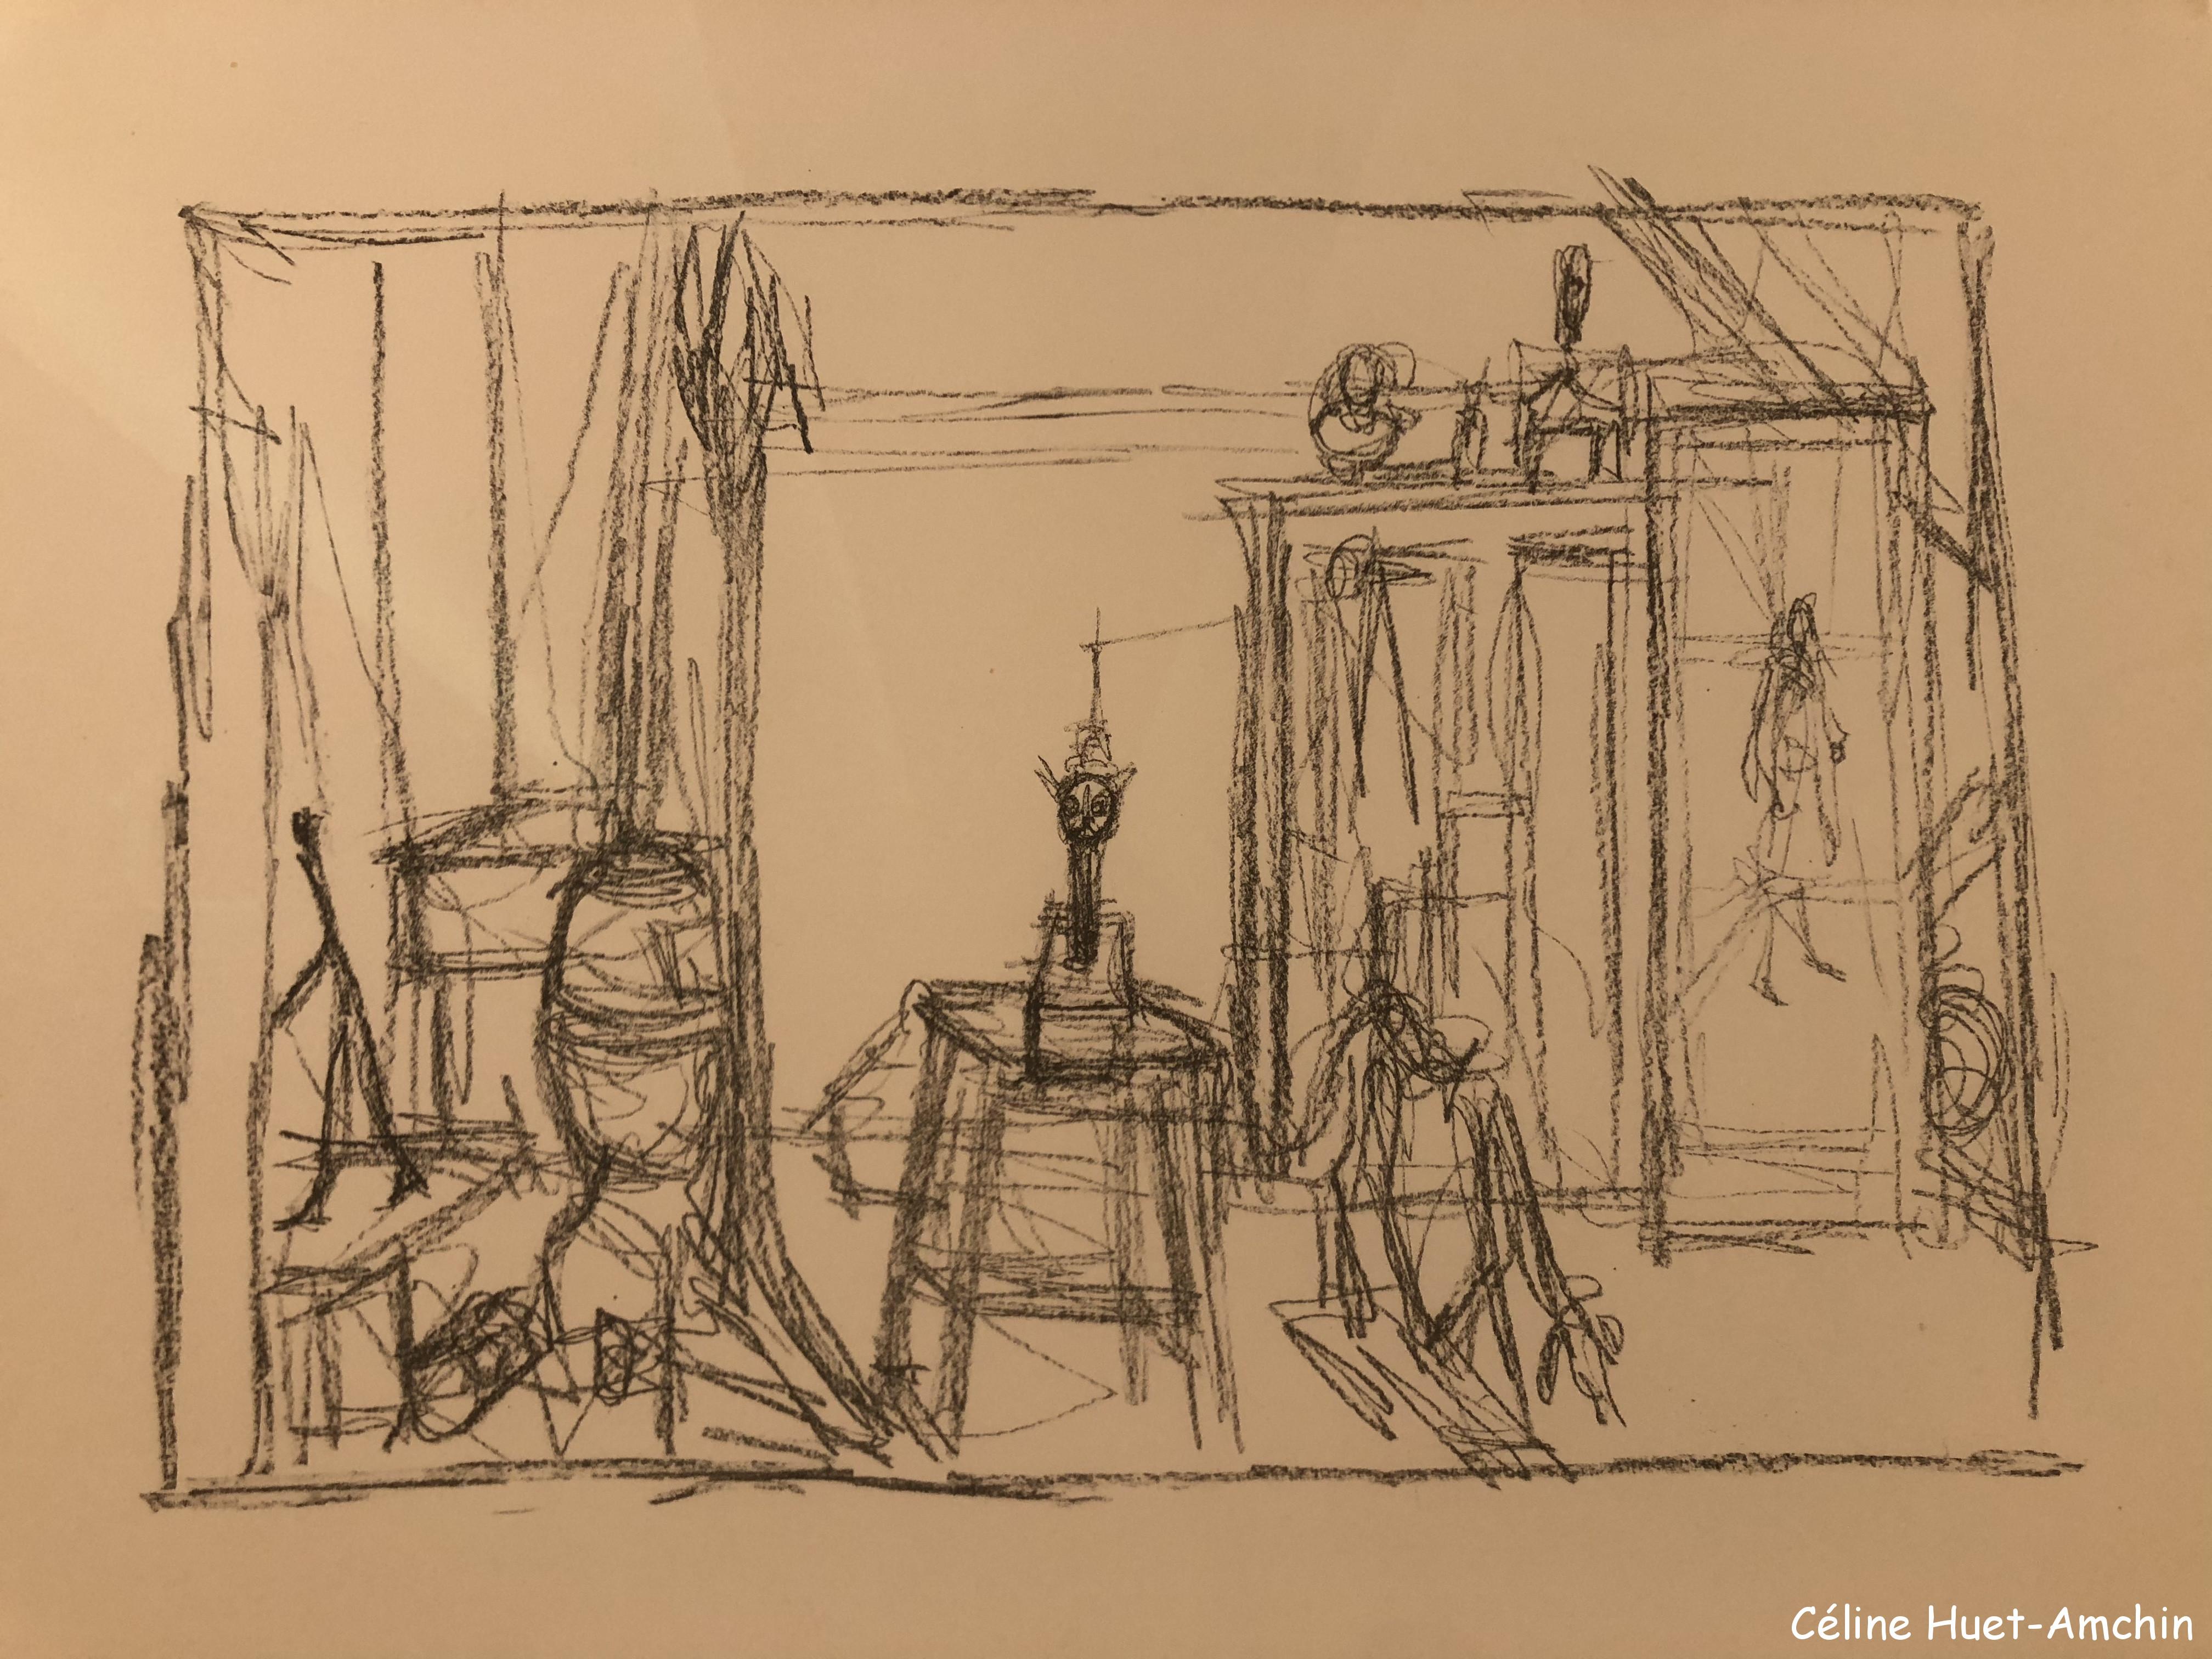 Epreuve d'essai Giacometti Institut Giacometti Paris